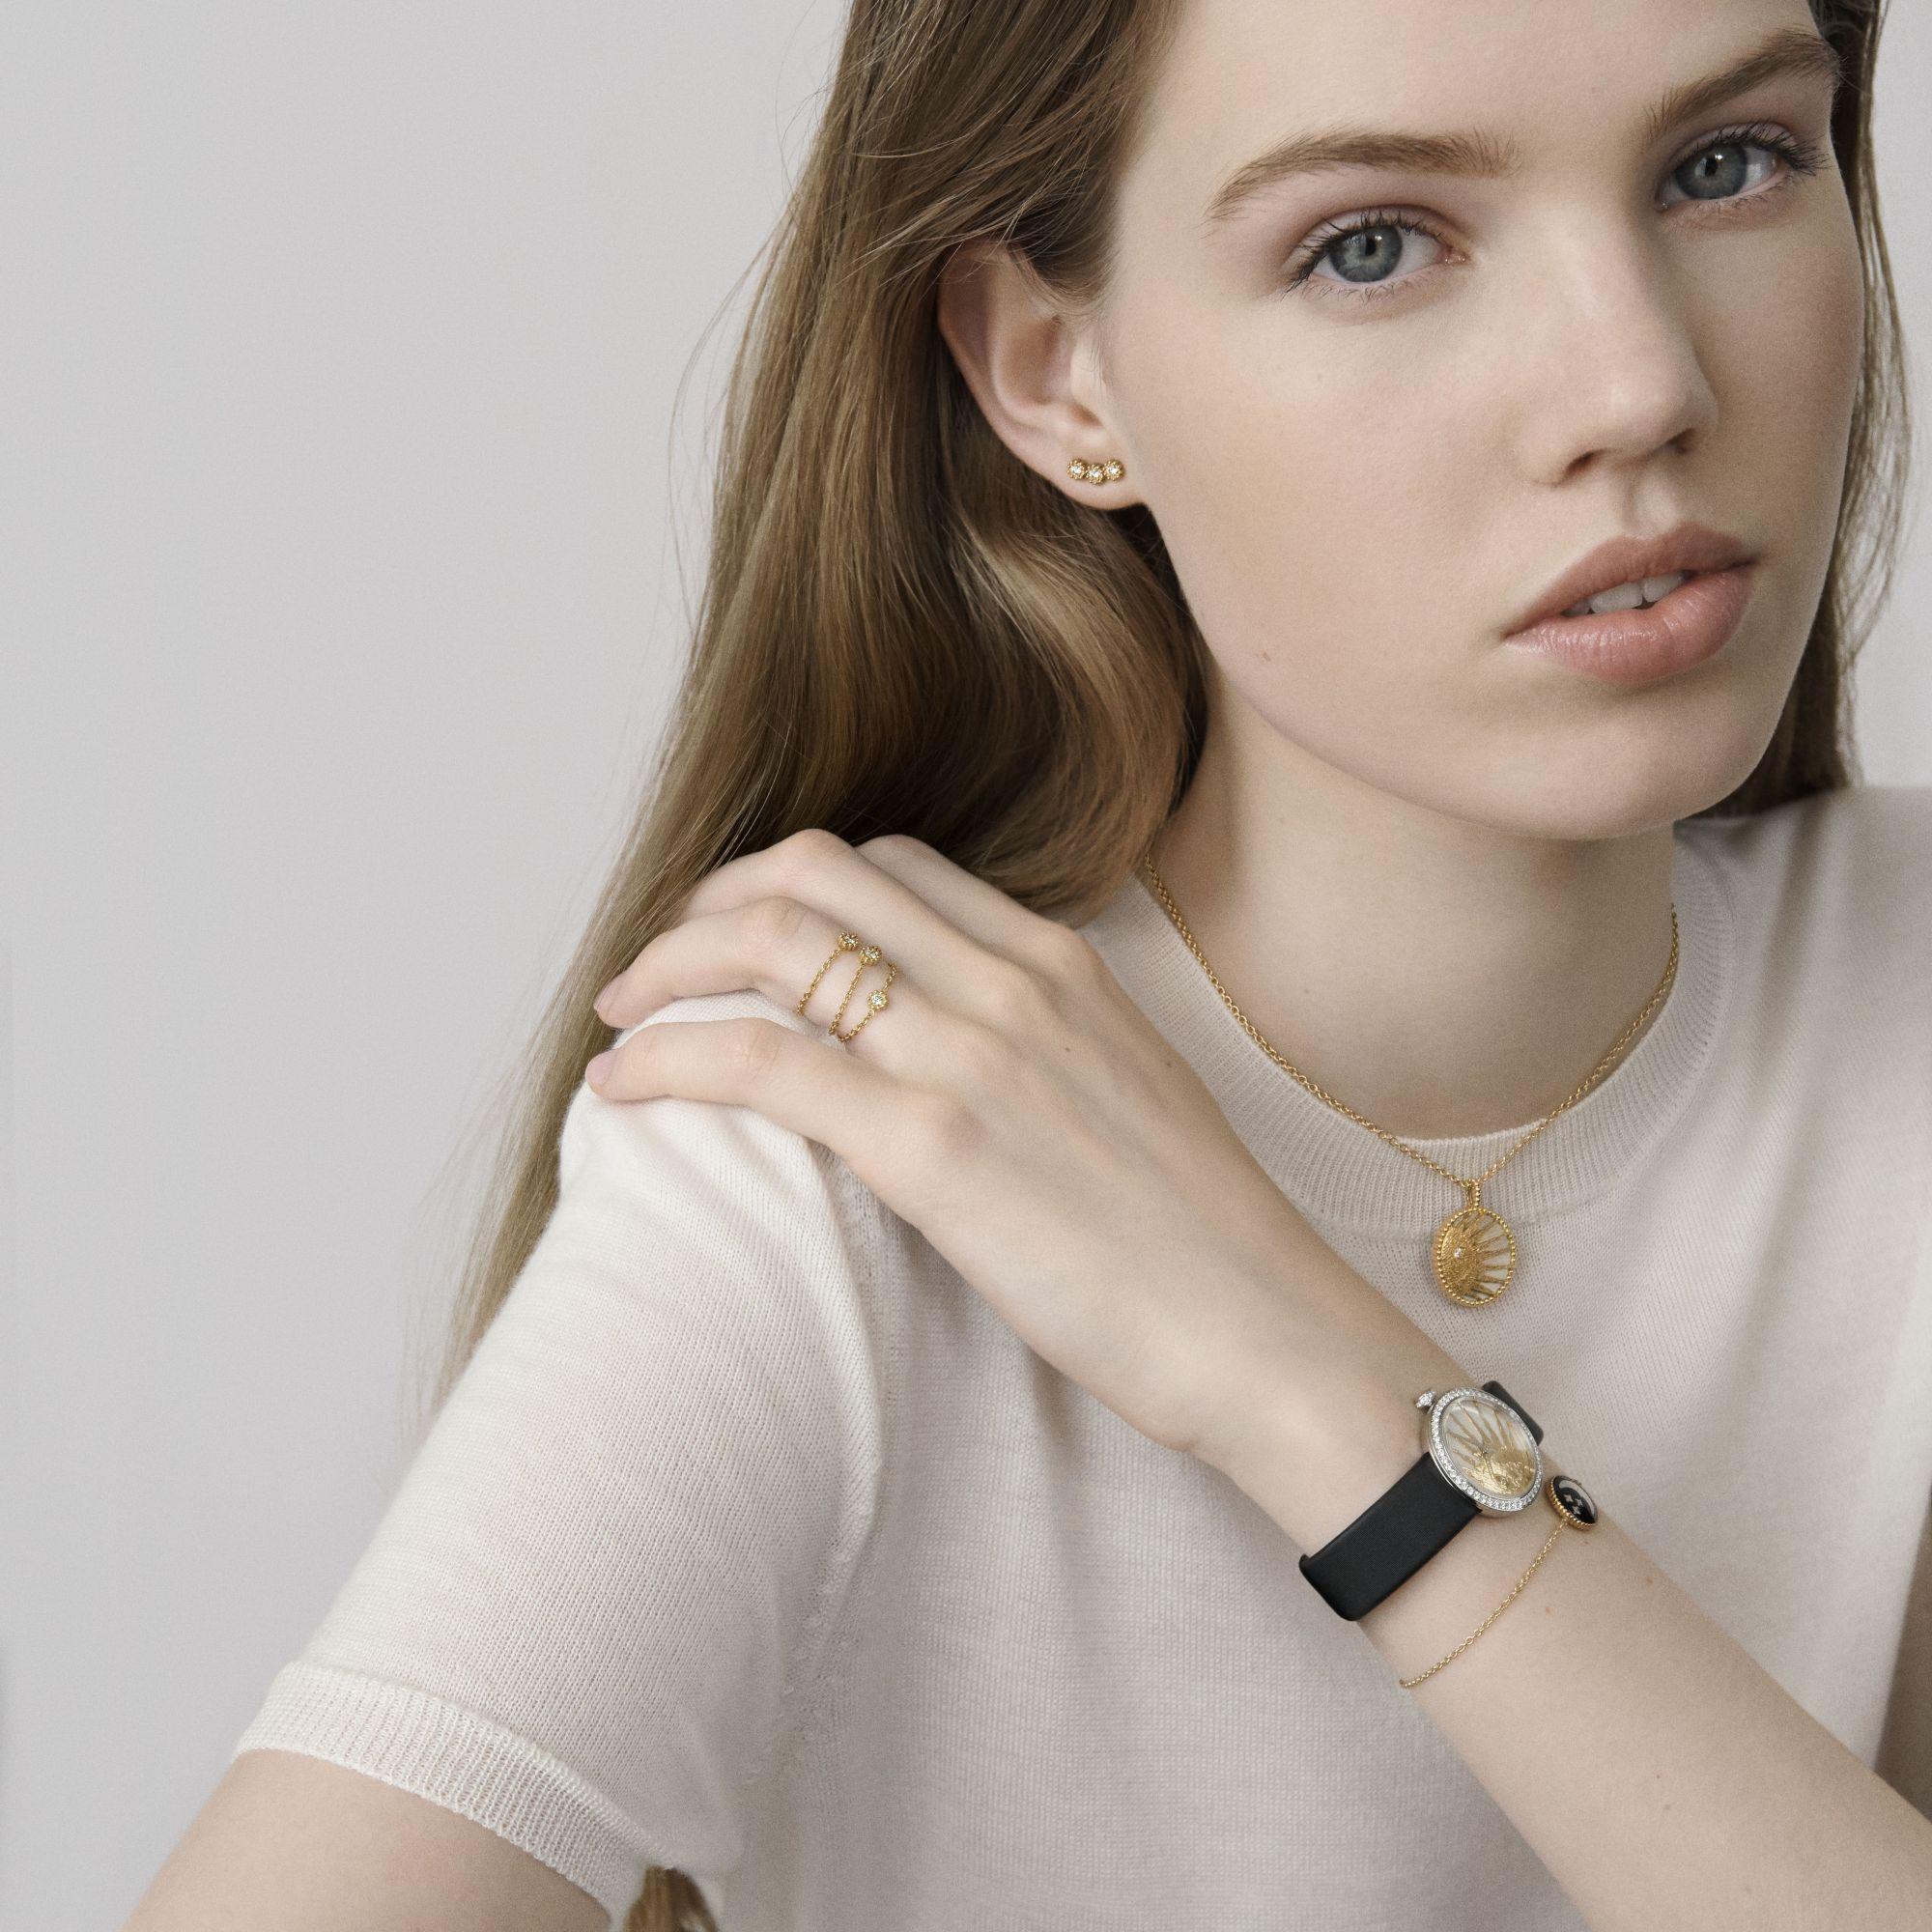 Dior Mimirose超微型珠寶,幸運守護你身邊!